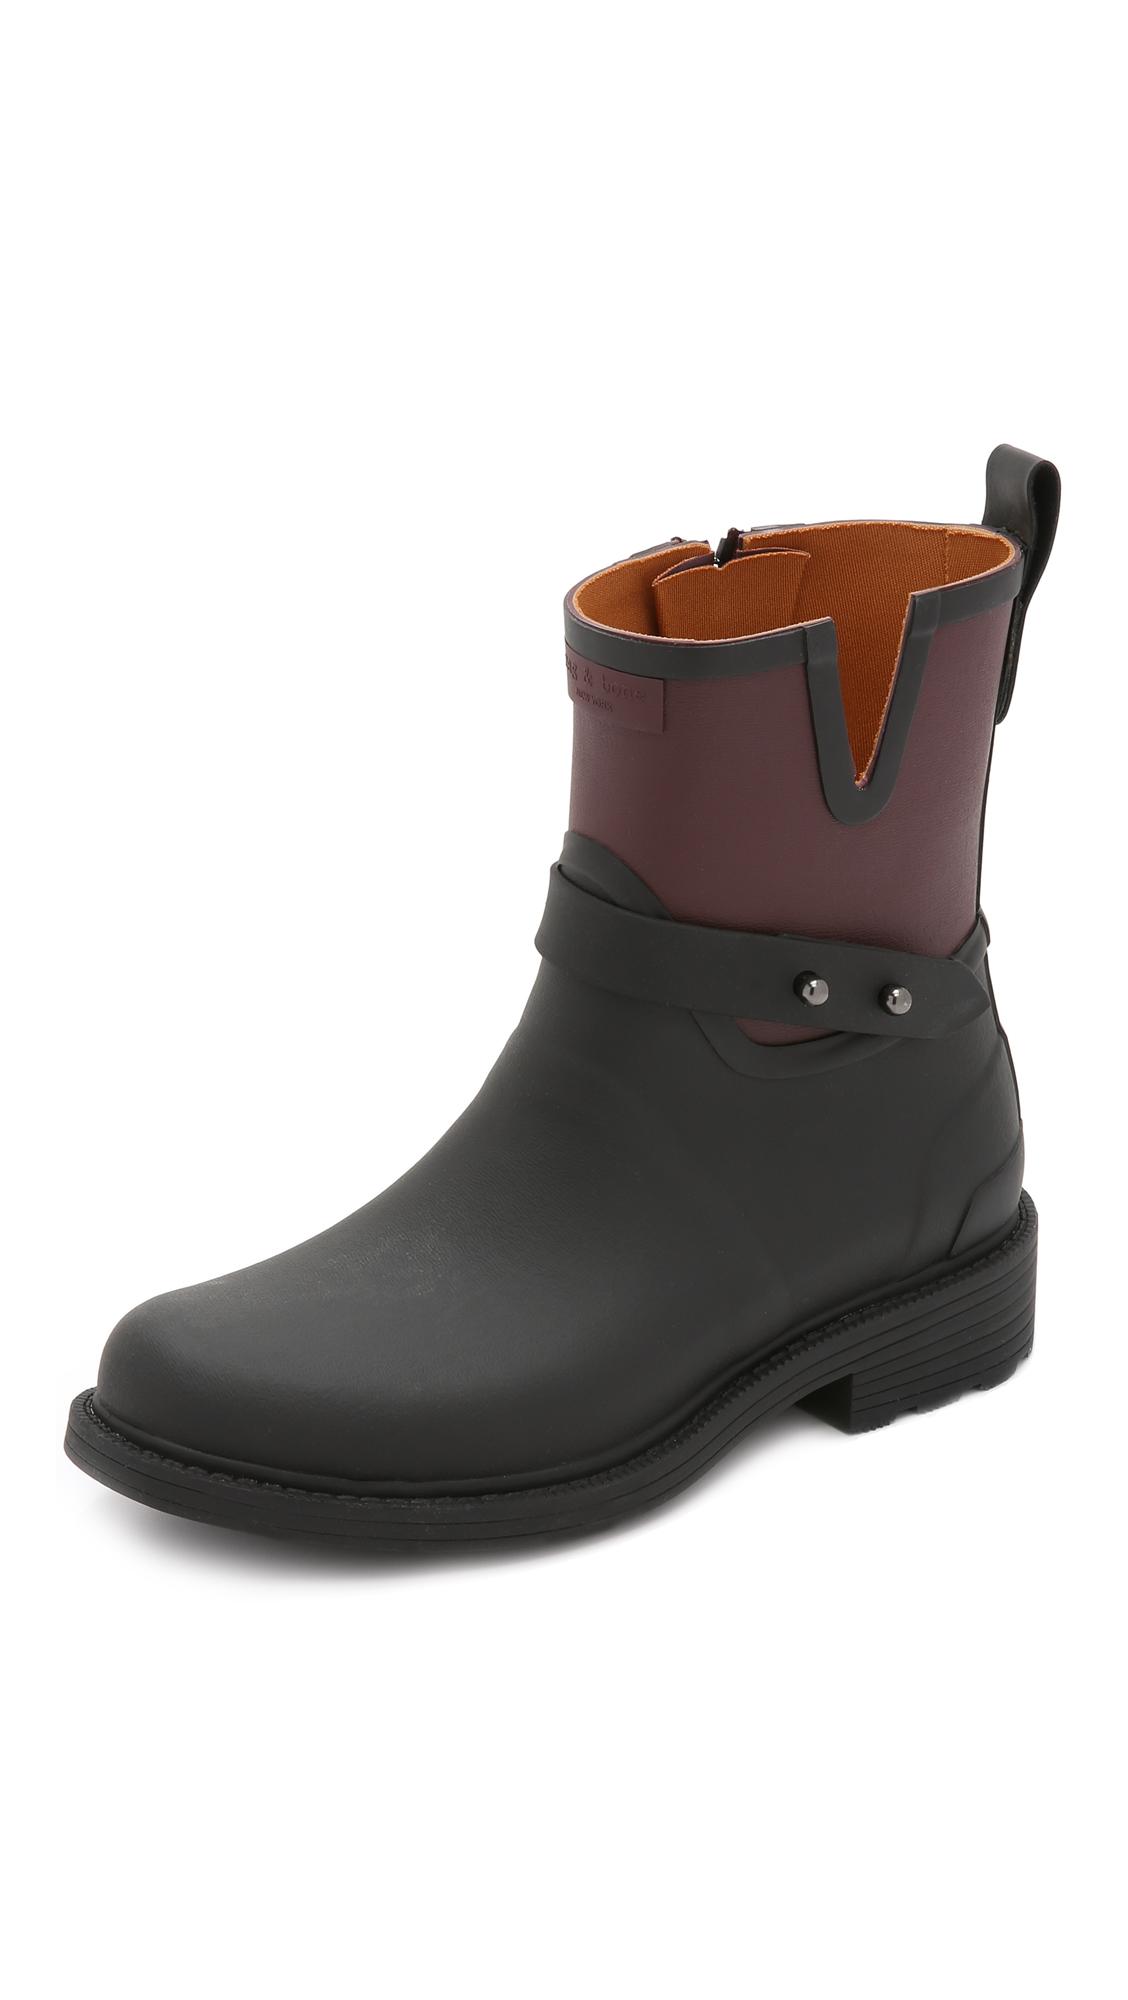 Rag Bone Moto Rain Boots Shopbop D Island Shoes Chukka Slip On Dark Brown Leather